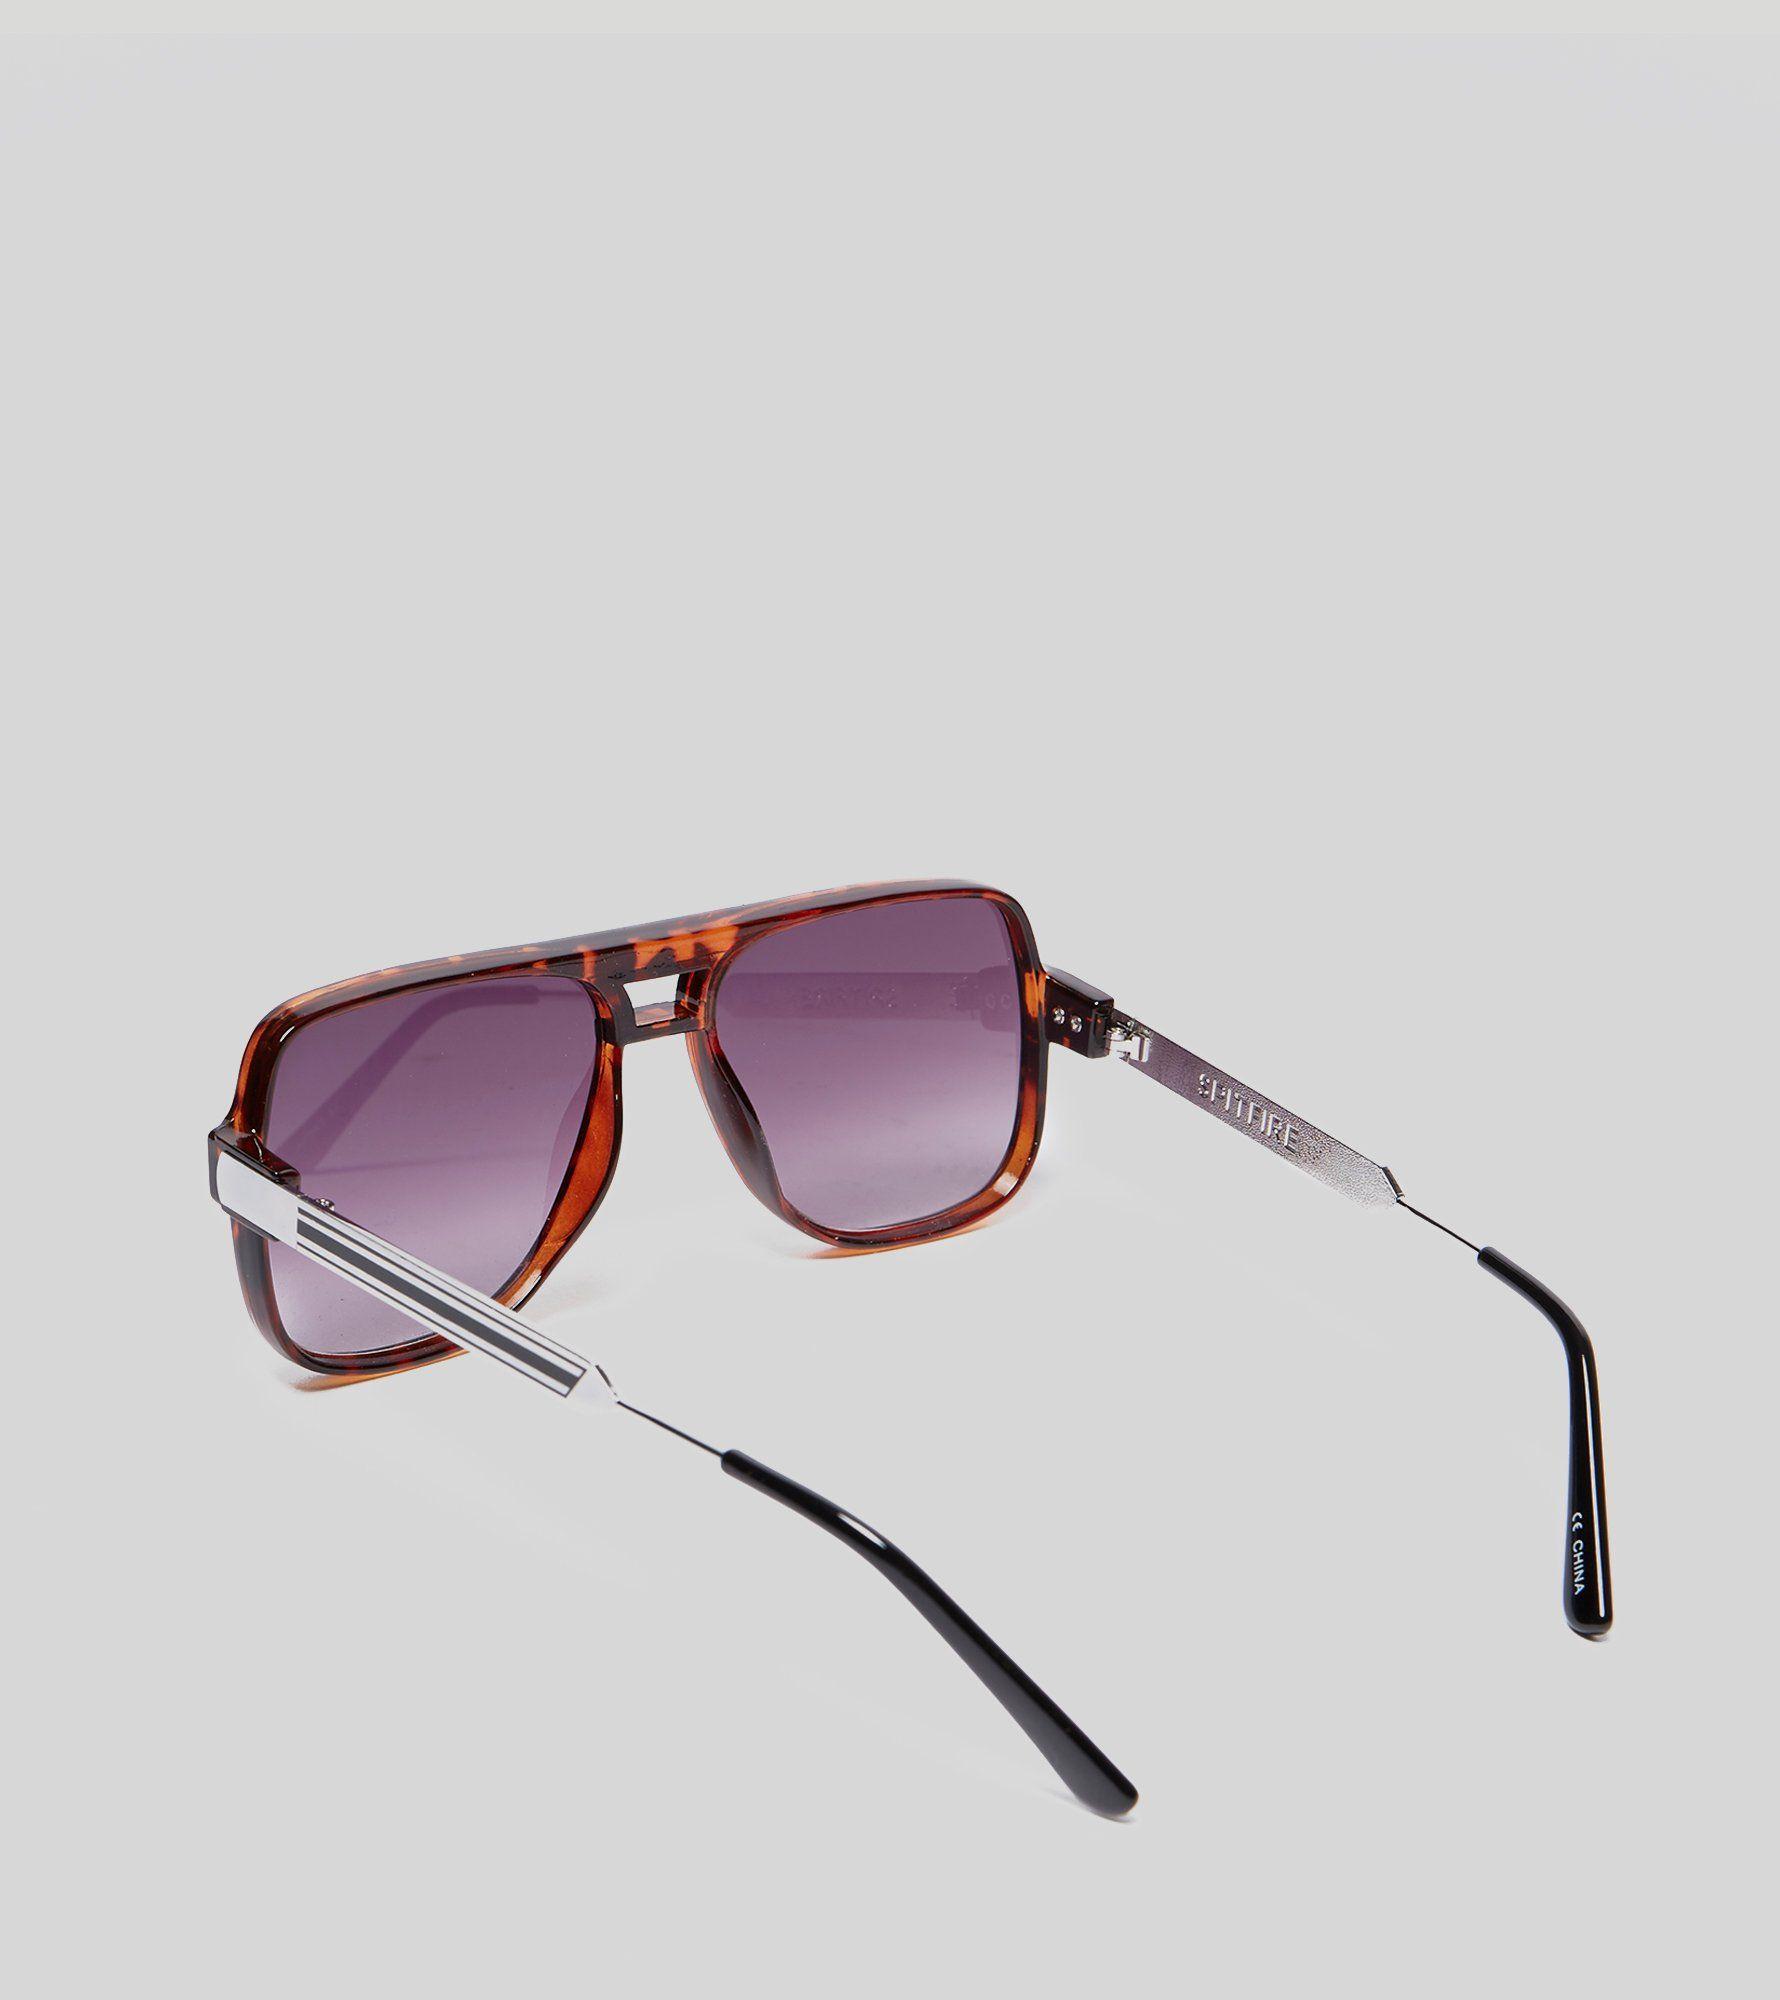 Spitfire Orbital Sunglasses